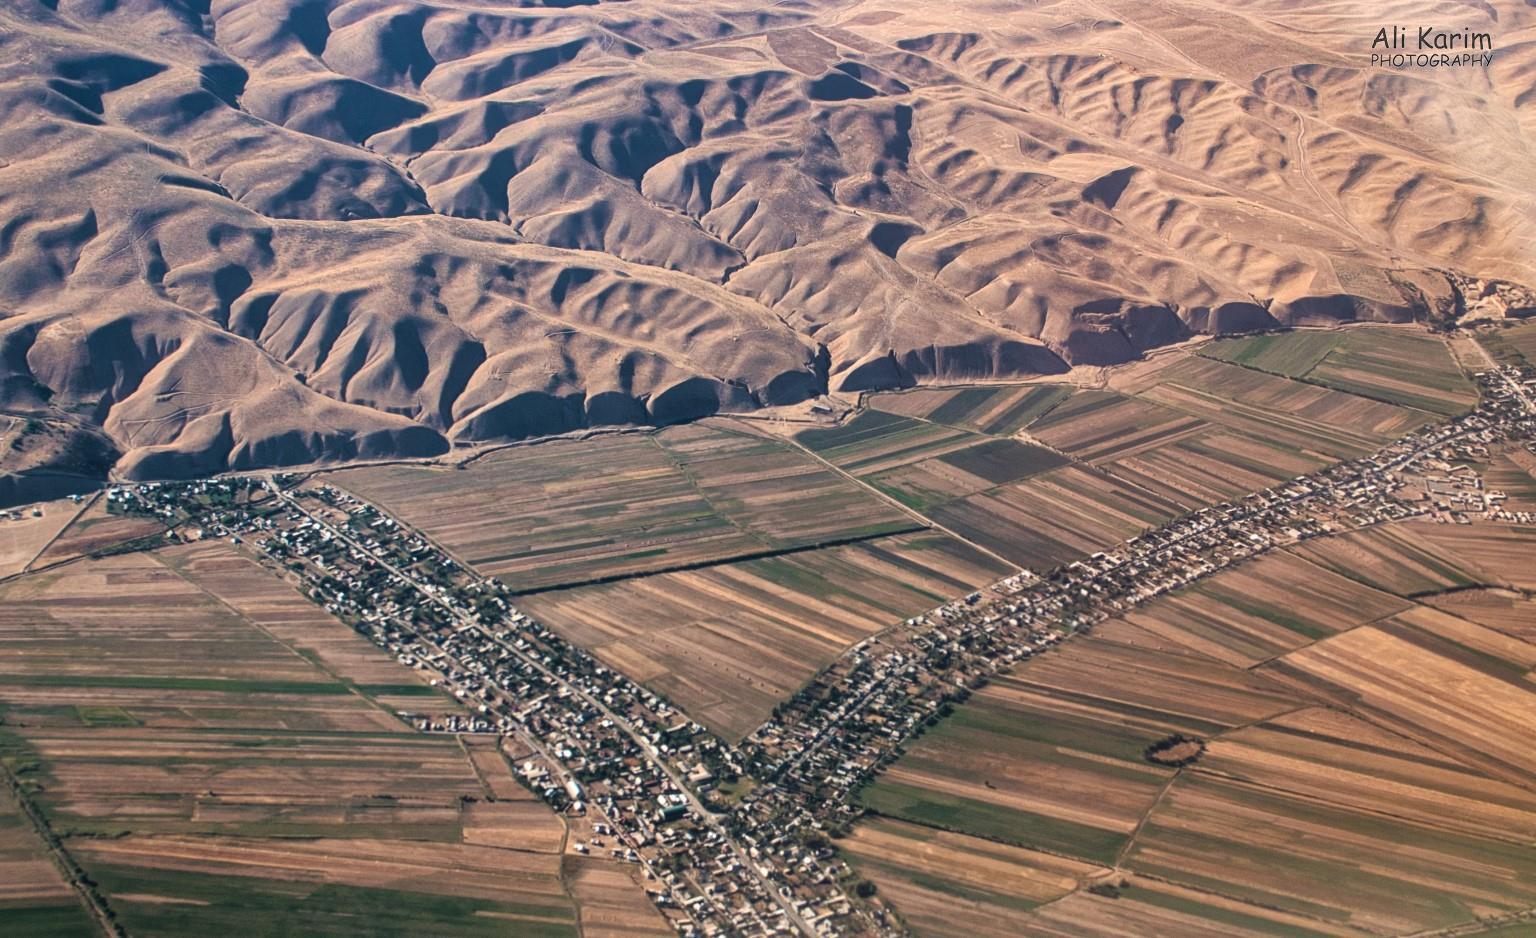 Silk Road 15: Osh, Kyrgyzstan Very organized farming, seemed like Soviet efficiencies for work and play